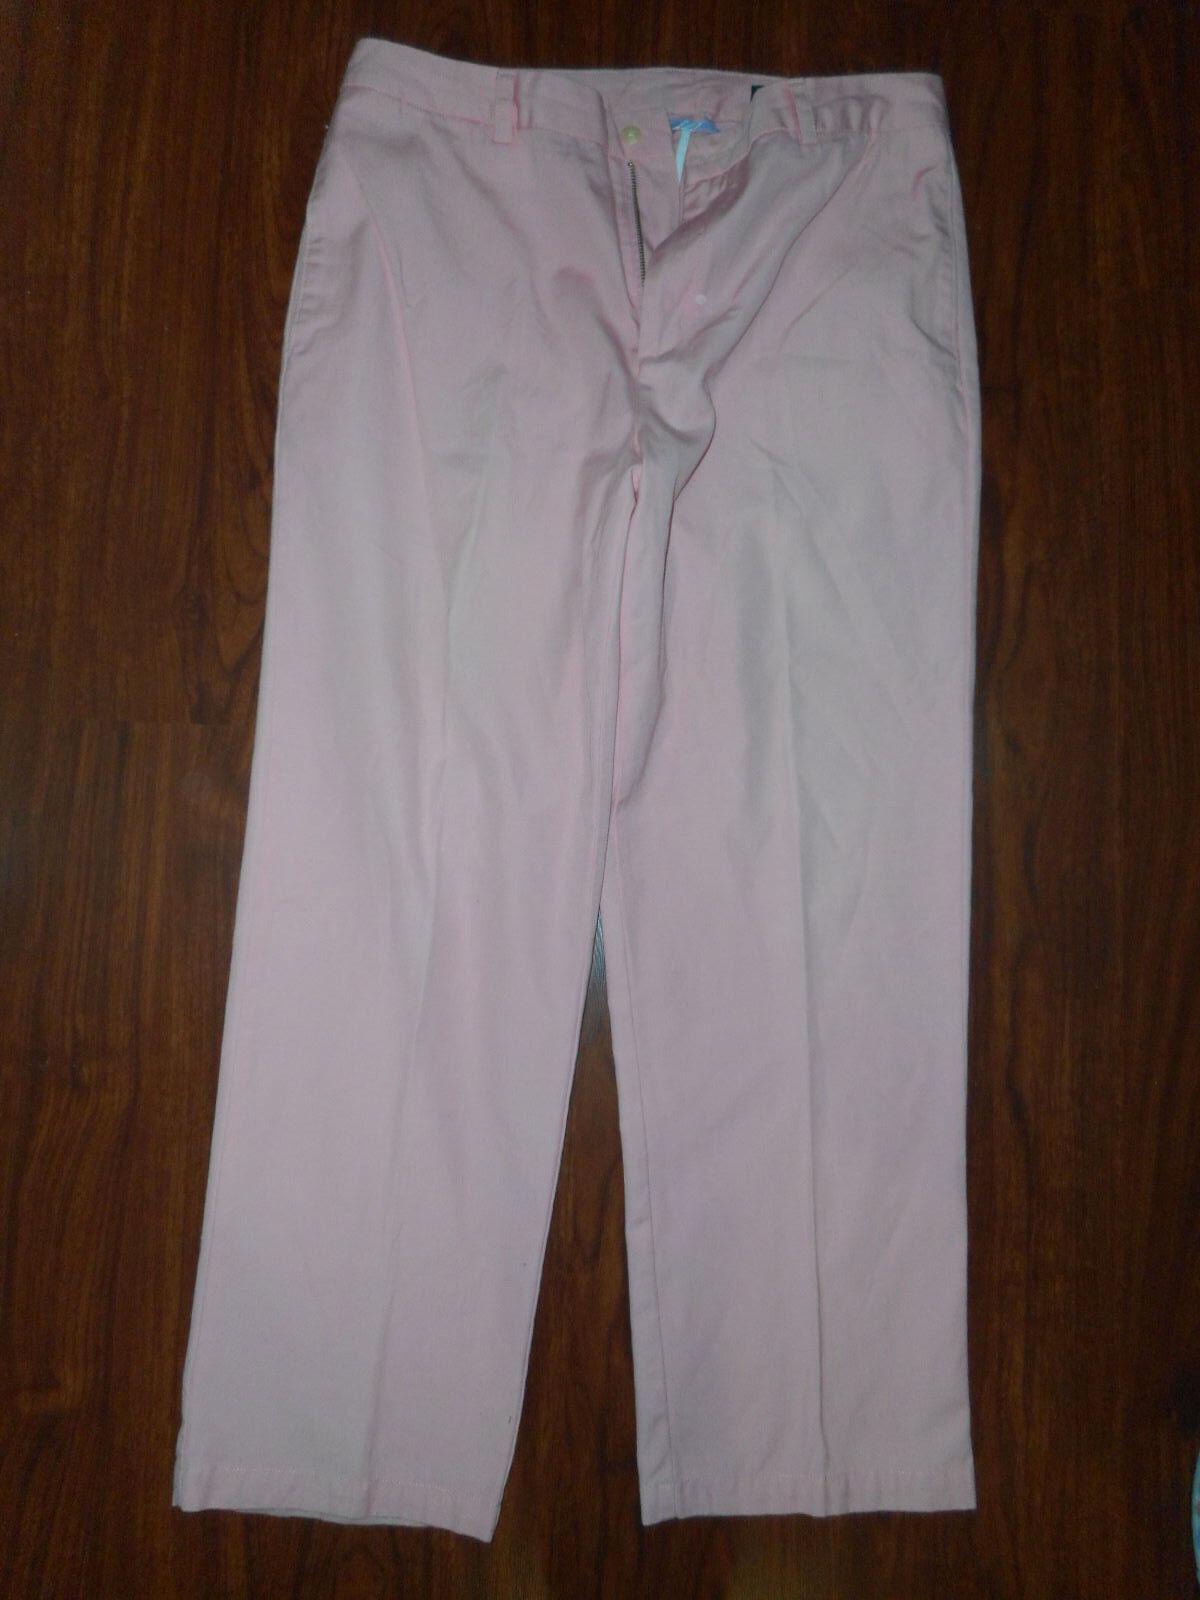 VINEYARD VINES Mens Club Casual Pants Pink Salmon Size 35 29 Cotton